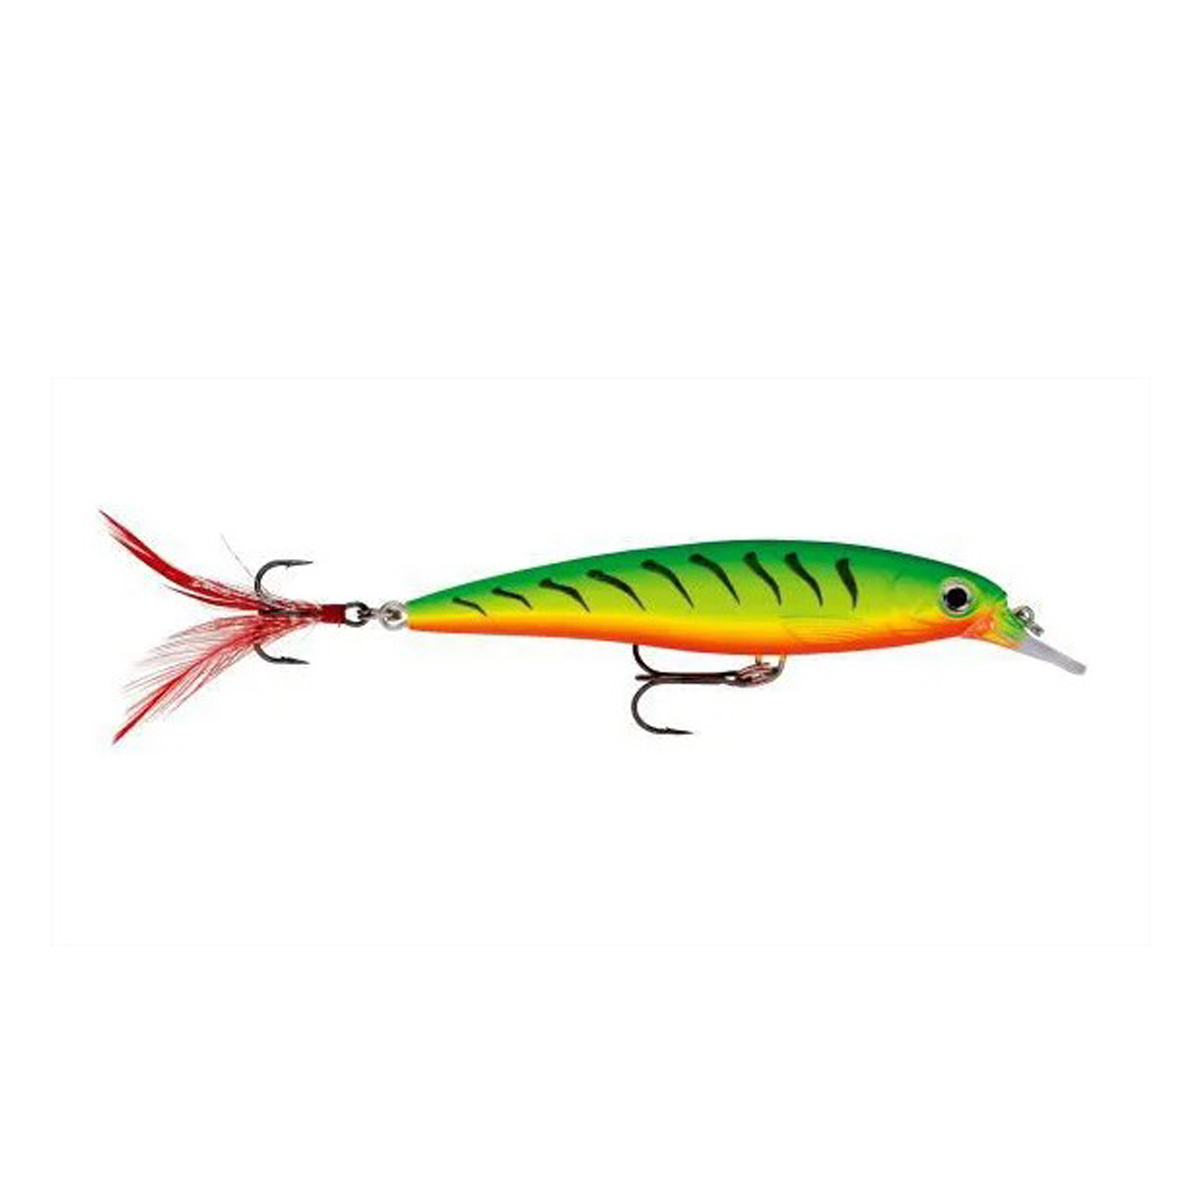 Isca Artificial XRap 10 cm (13 g)  - Pró Pesca Shop